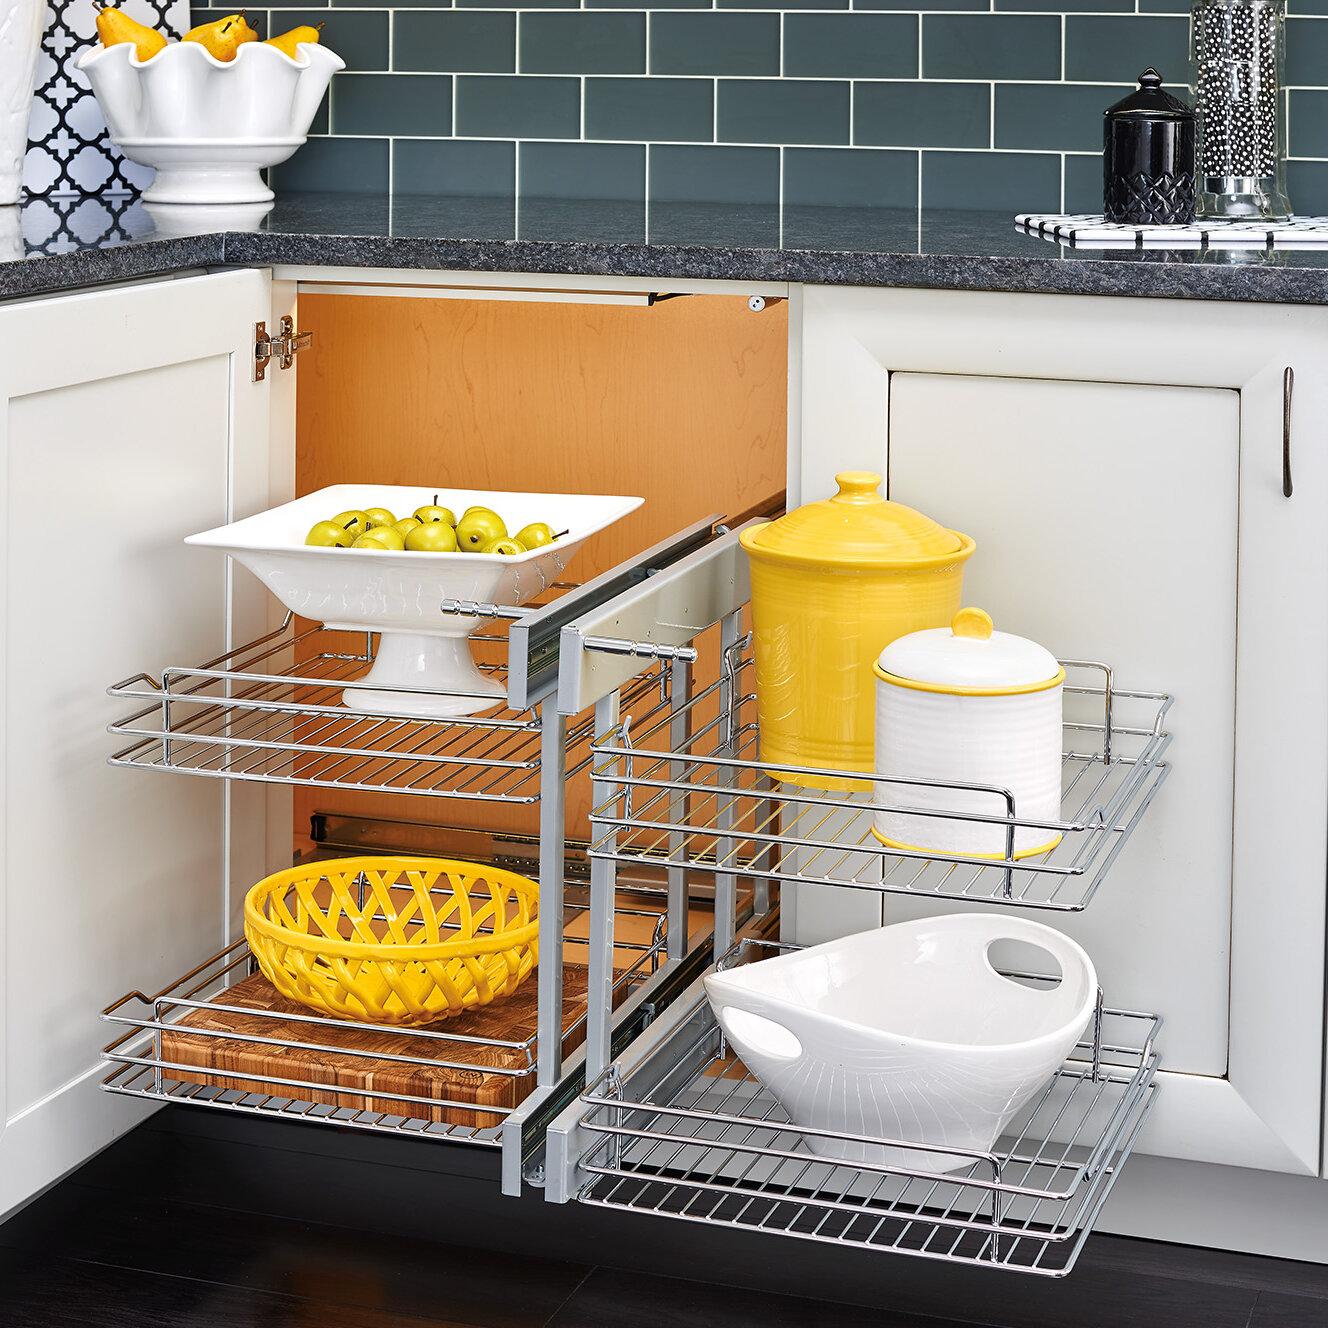 Rev A Shelf Blind Corner Cabinet Pull Out Chrome 2 Tier Basket Organizer U0026  Reviews | Wayfair